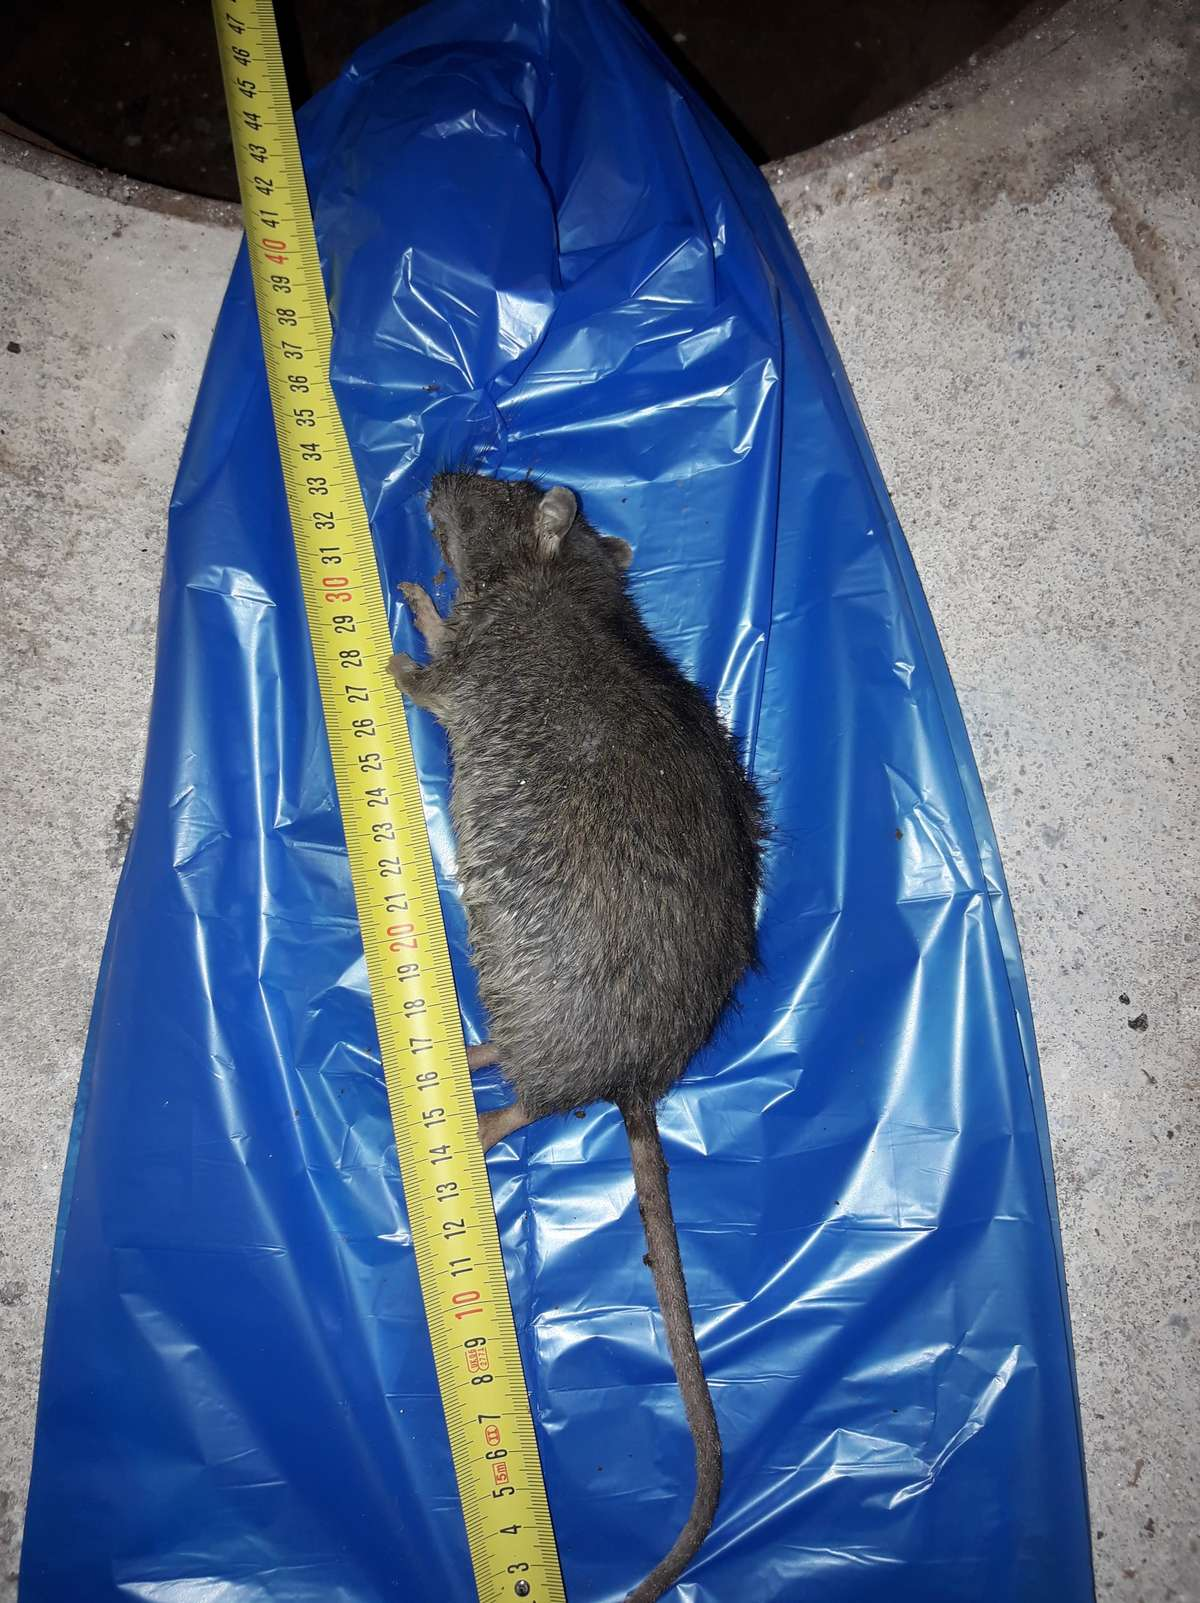 Mieszkanka Elbląga mieszka w domu ze szczurami